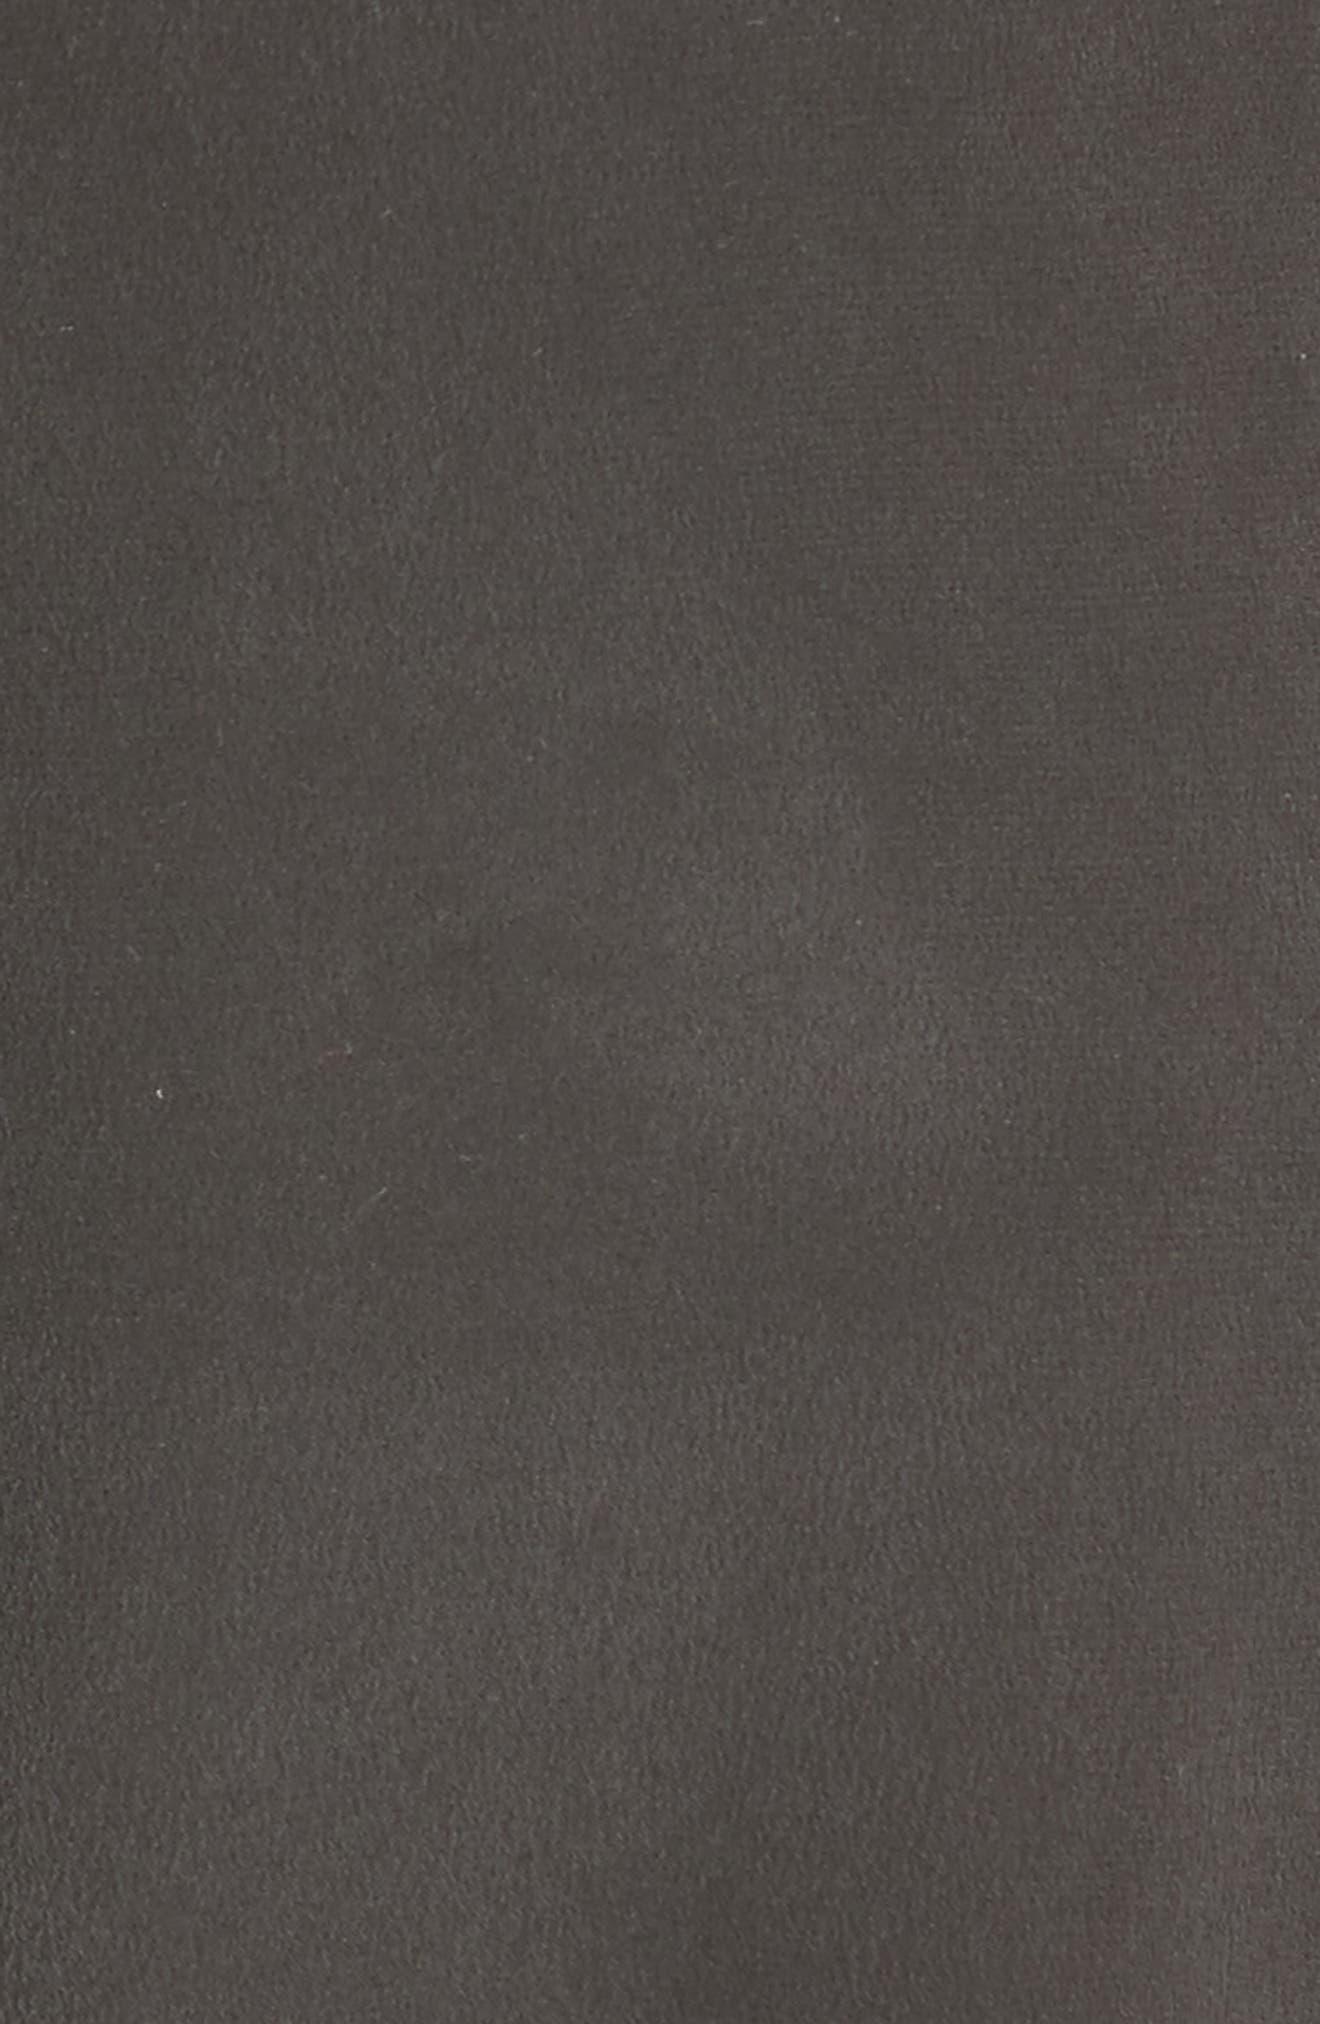 Bevin Silk Crop Cargo Pants,                             Alternate thumbnail 5, color,                             001